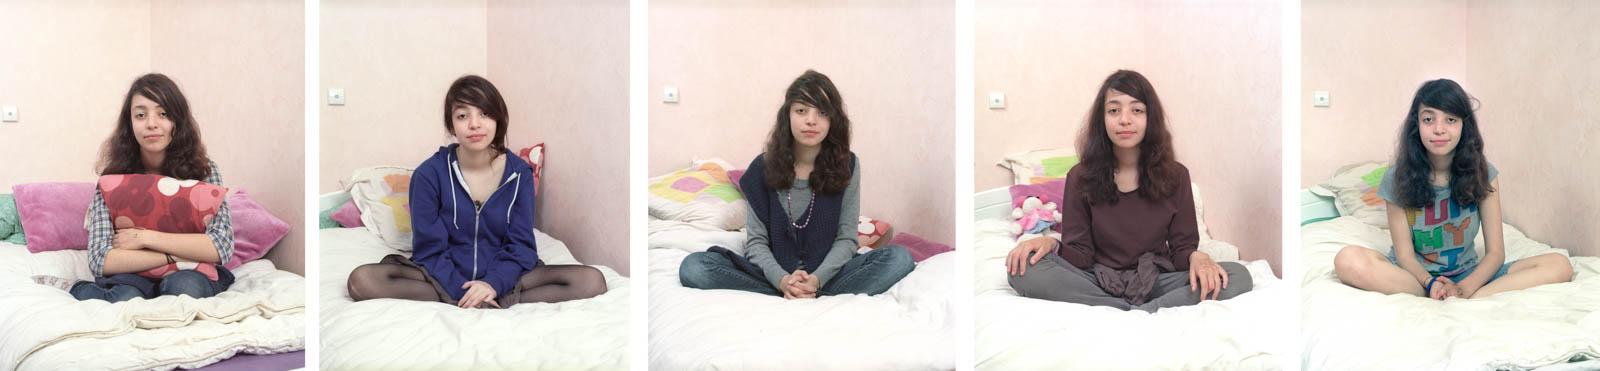 adolescents-3